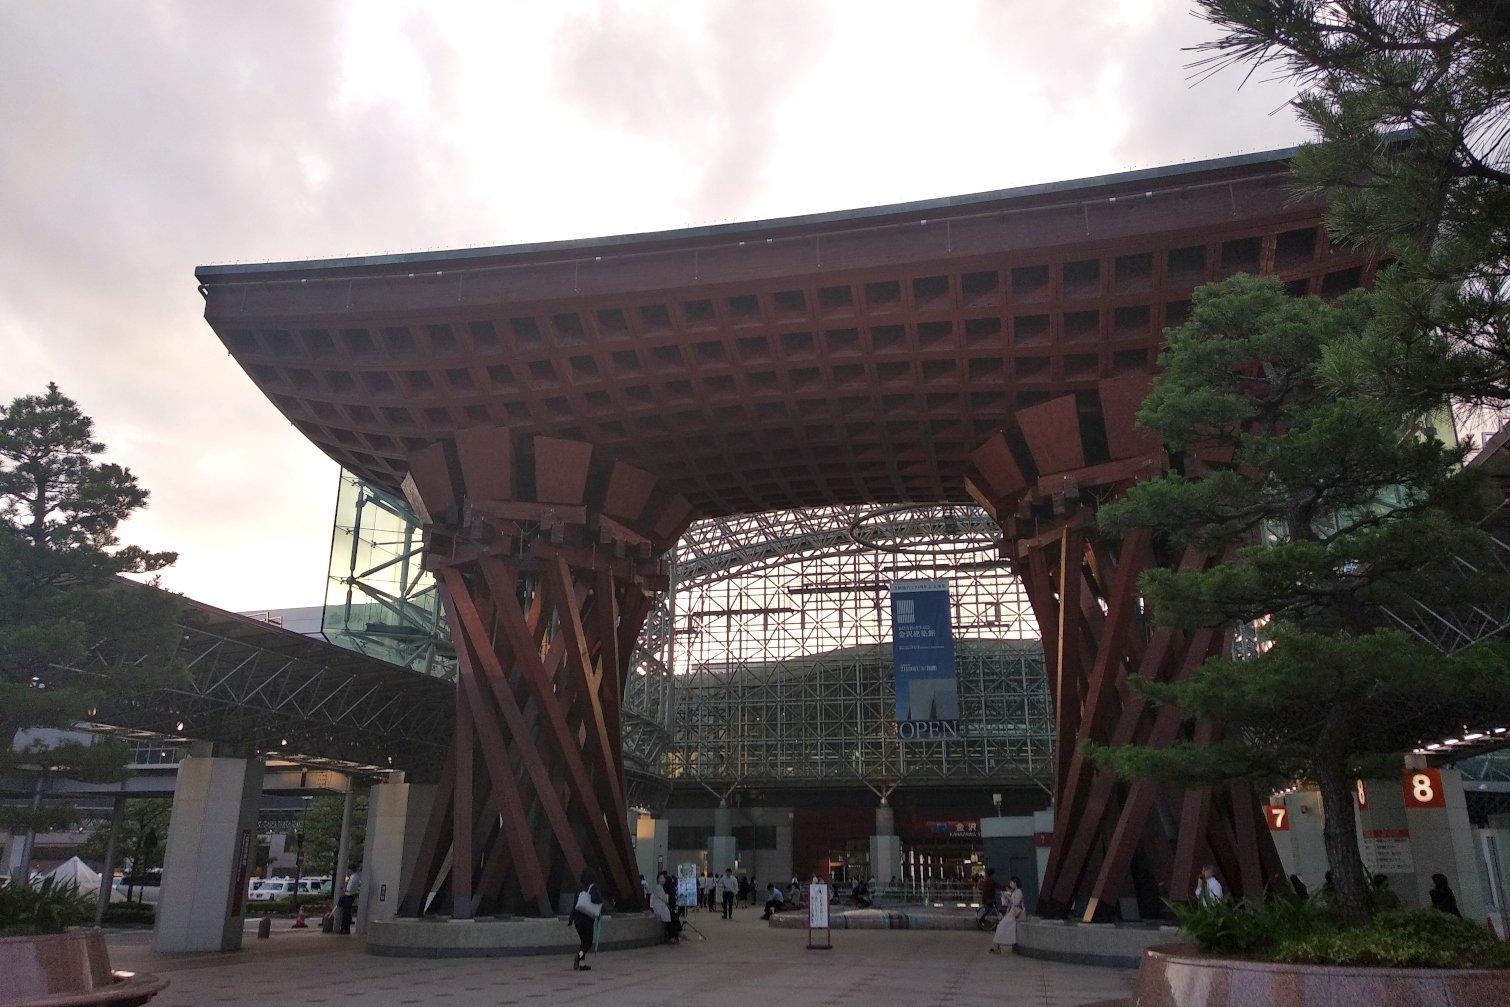 Kanazawa Japan travel; What to do in Kanazawa Japan; What to see in Kanazawa Japan; D.I.Y. Japan itinerary